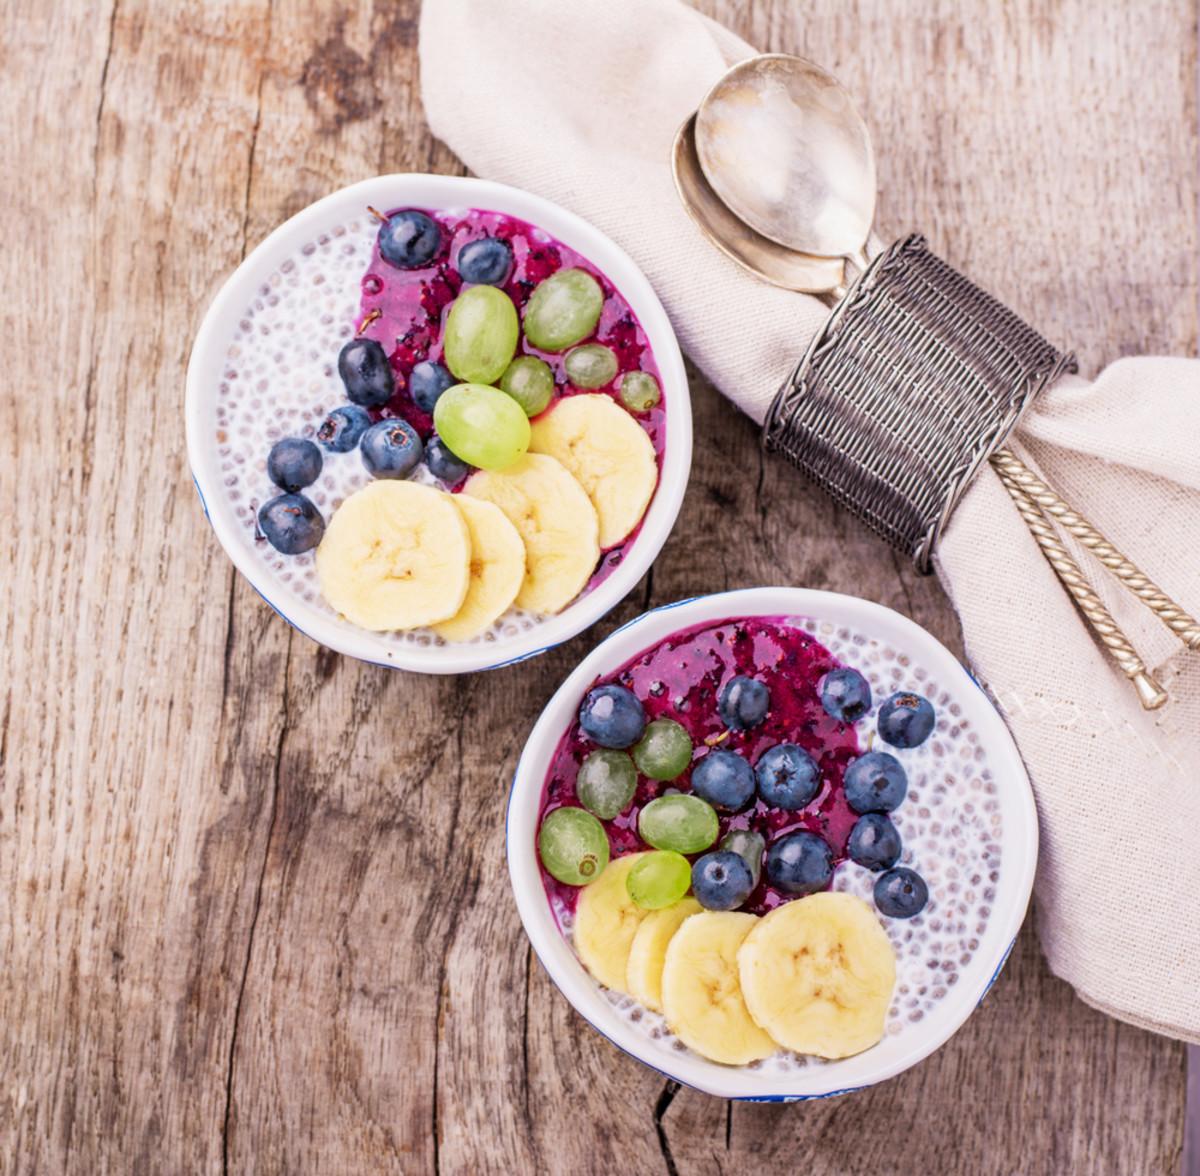 Vegan Breakfast Videos  31 Vegan Breakfast Recipes That ll Make You Happy You re